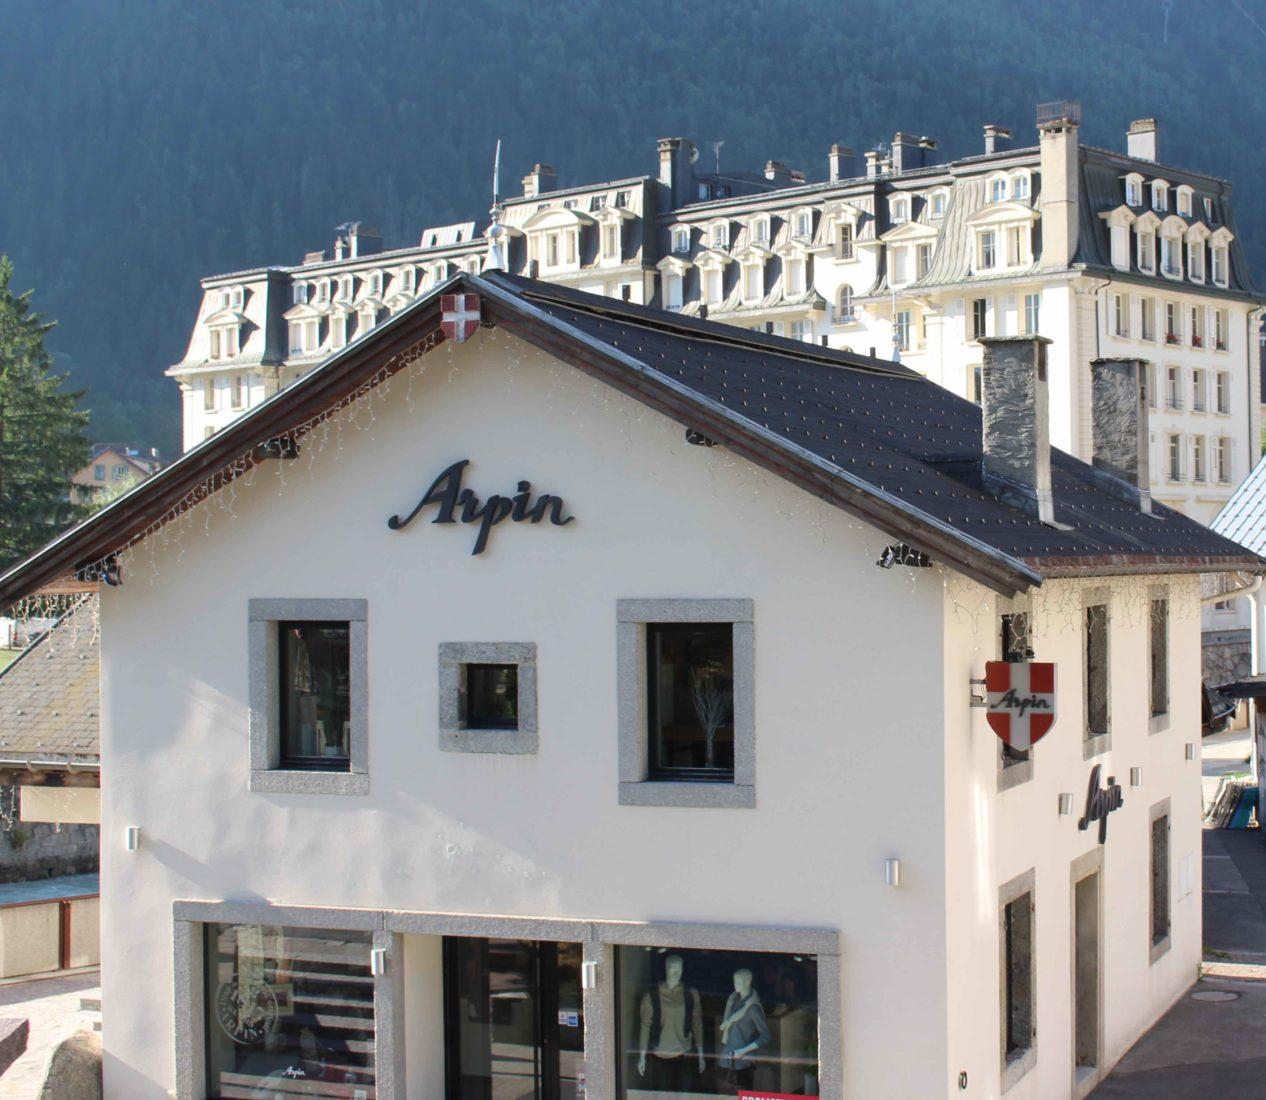 Chamonix boutique Arpin